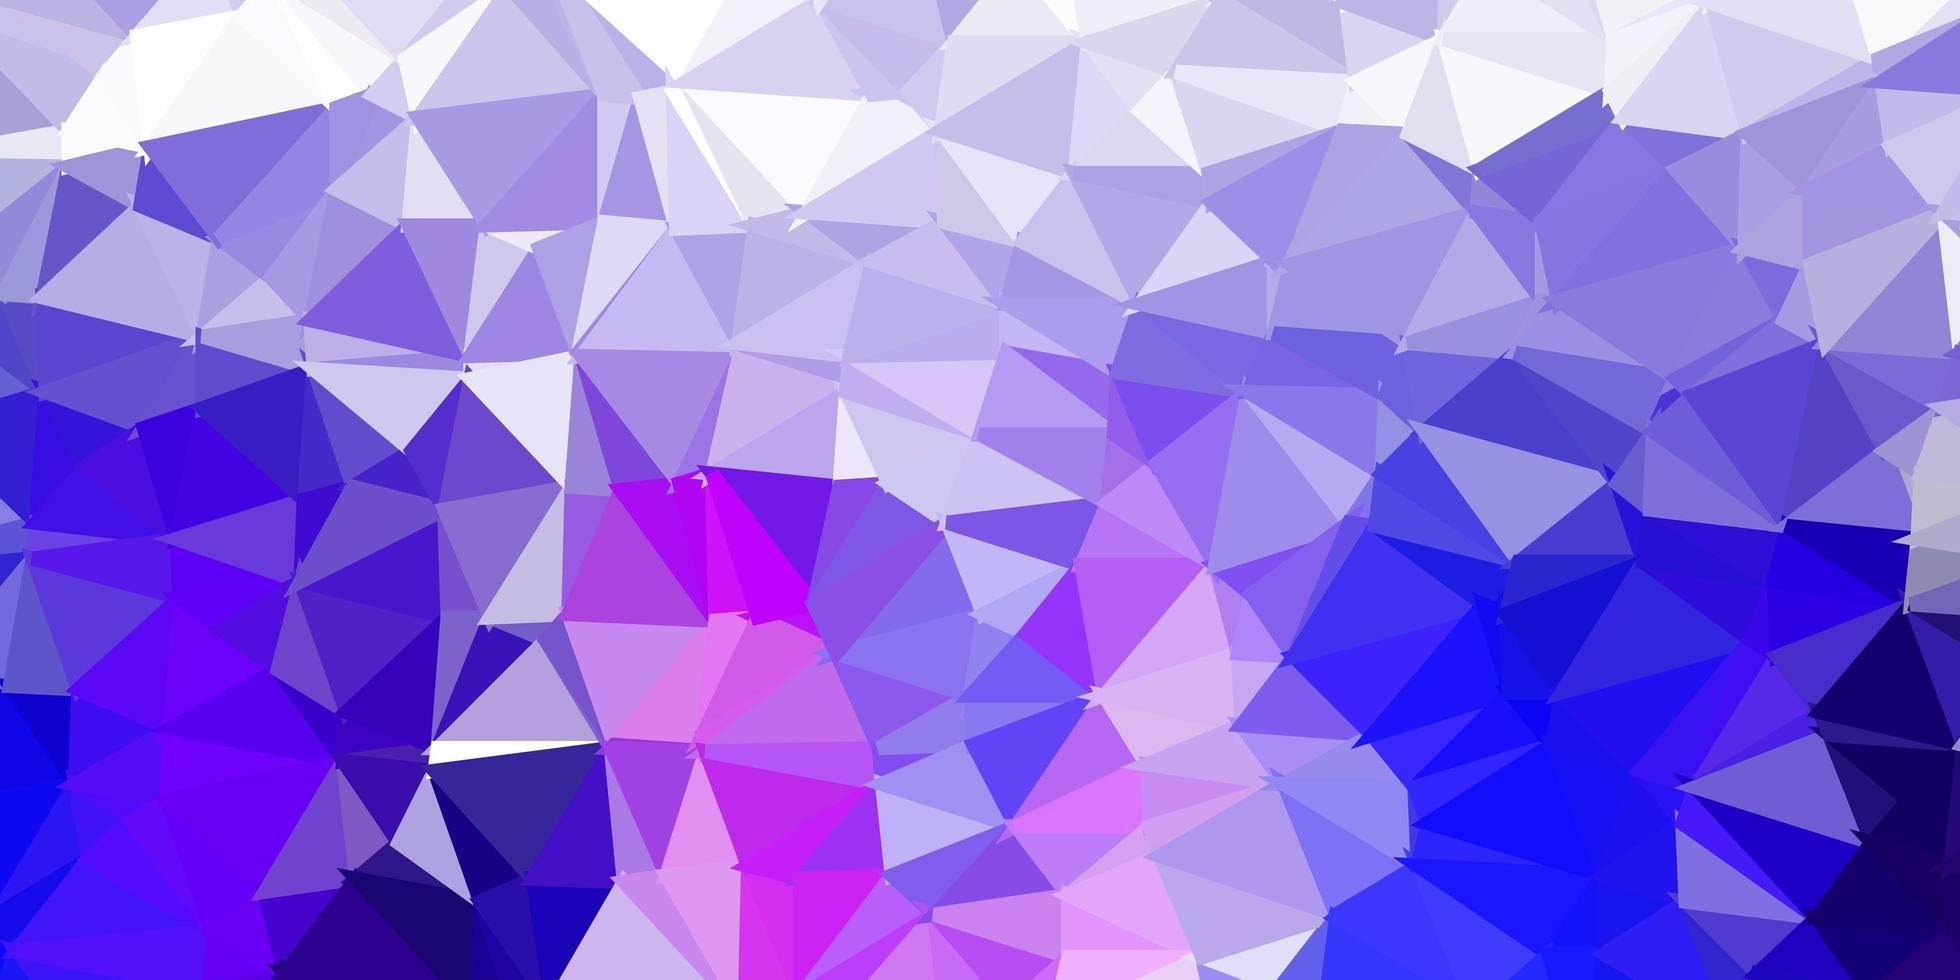 mörkrosa, blå vektor polygonal bakgrund.